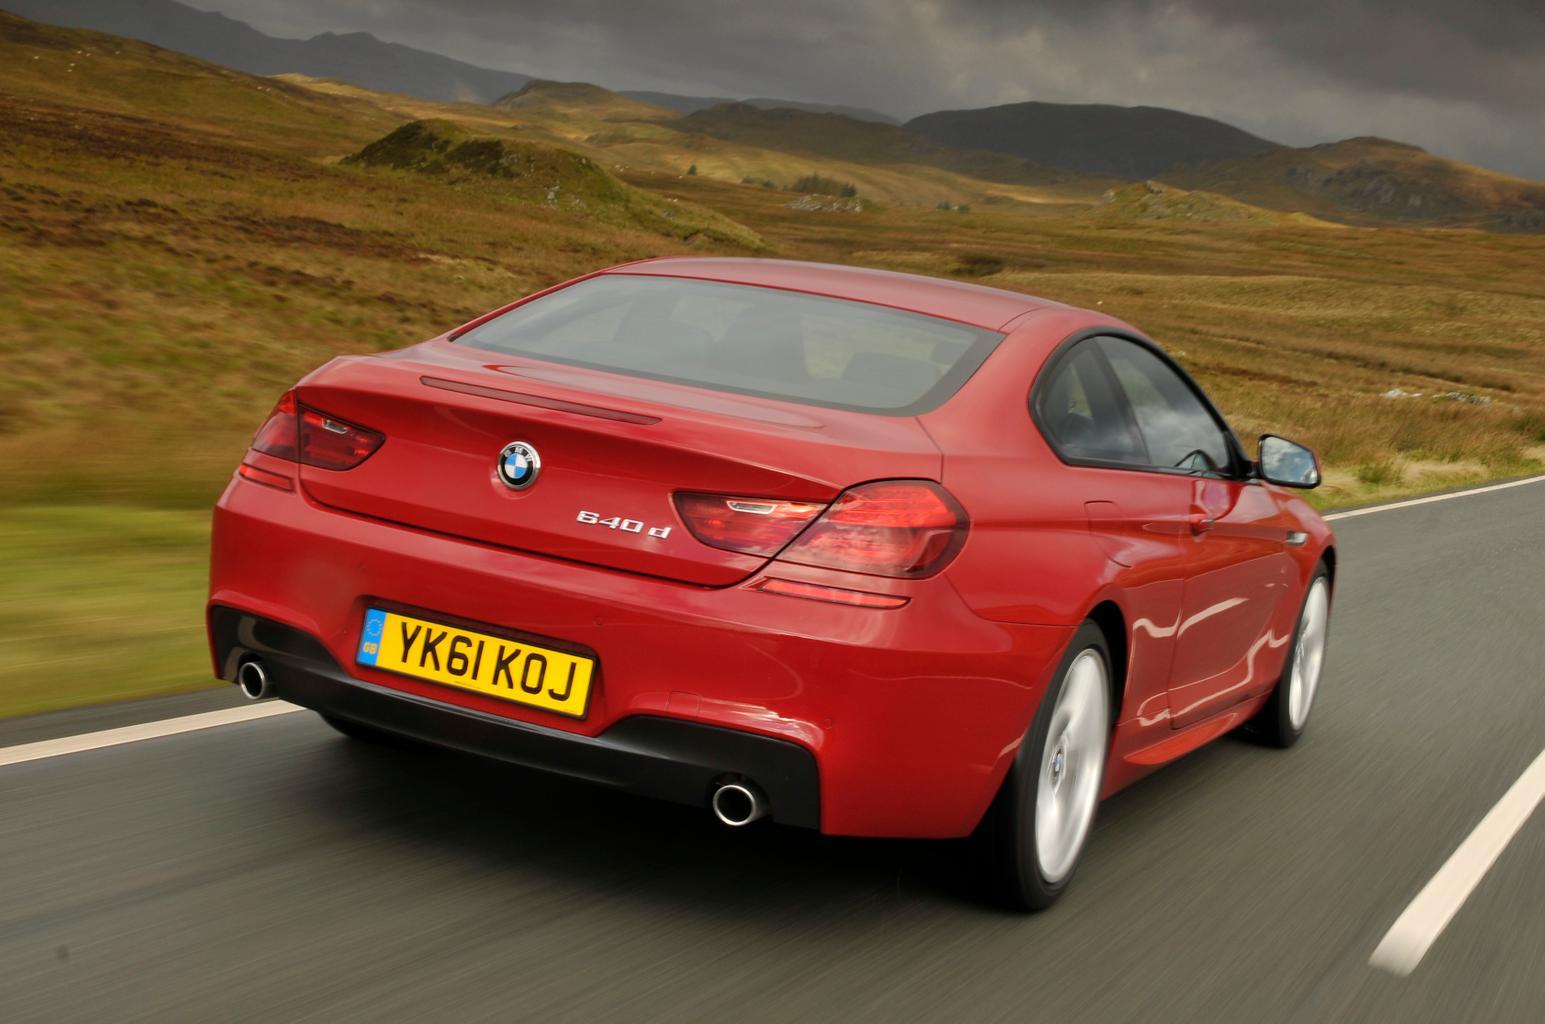 Used BMW 6 Series Coupe vs Jaguar XK